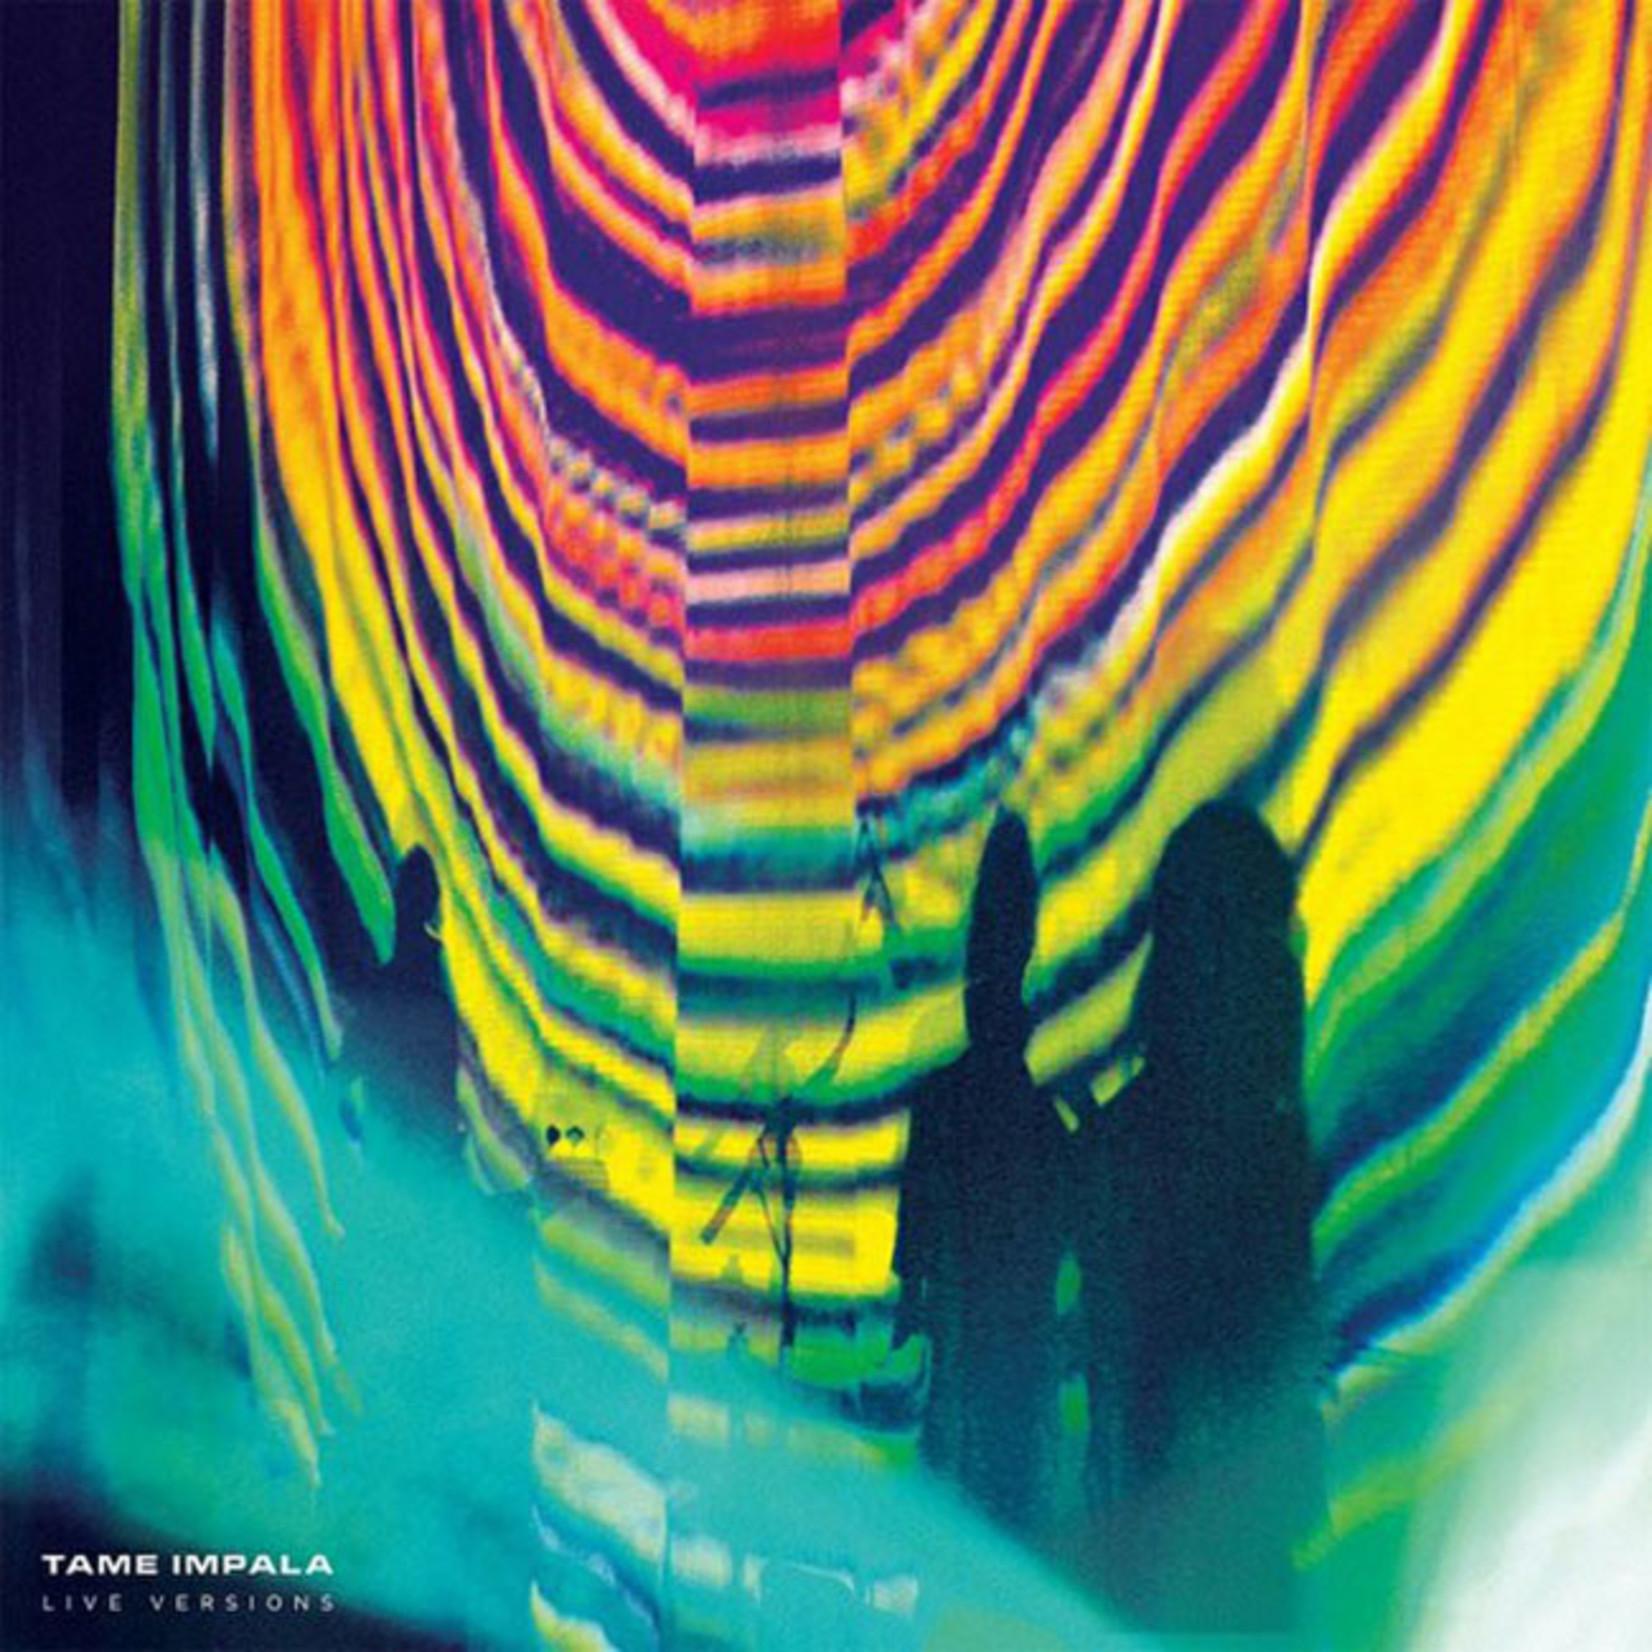 [New] Tame Impala: Live Versions